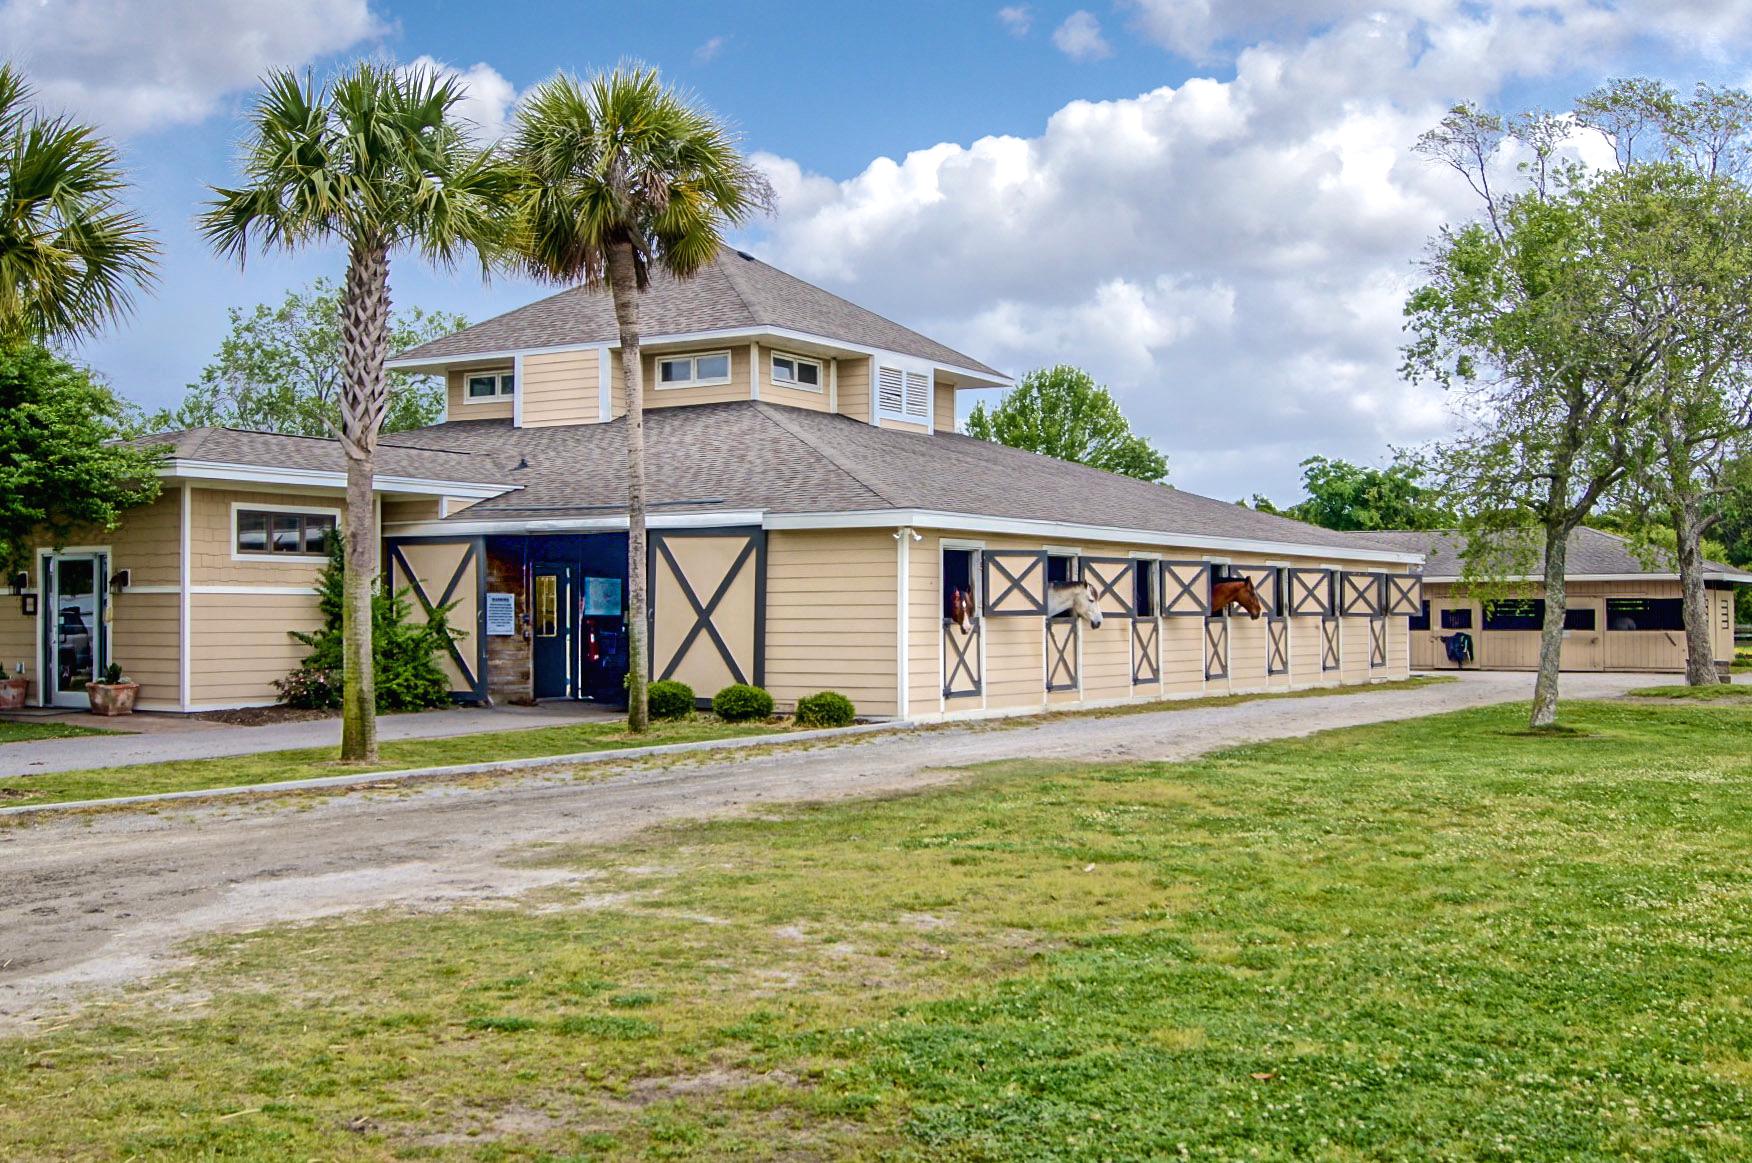 Seabrook Island Area Photo - Equetrian Center.jpg